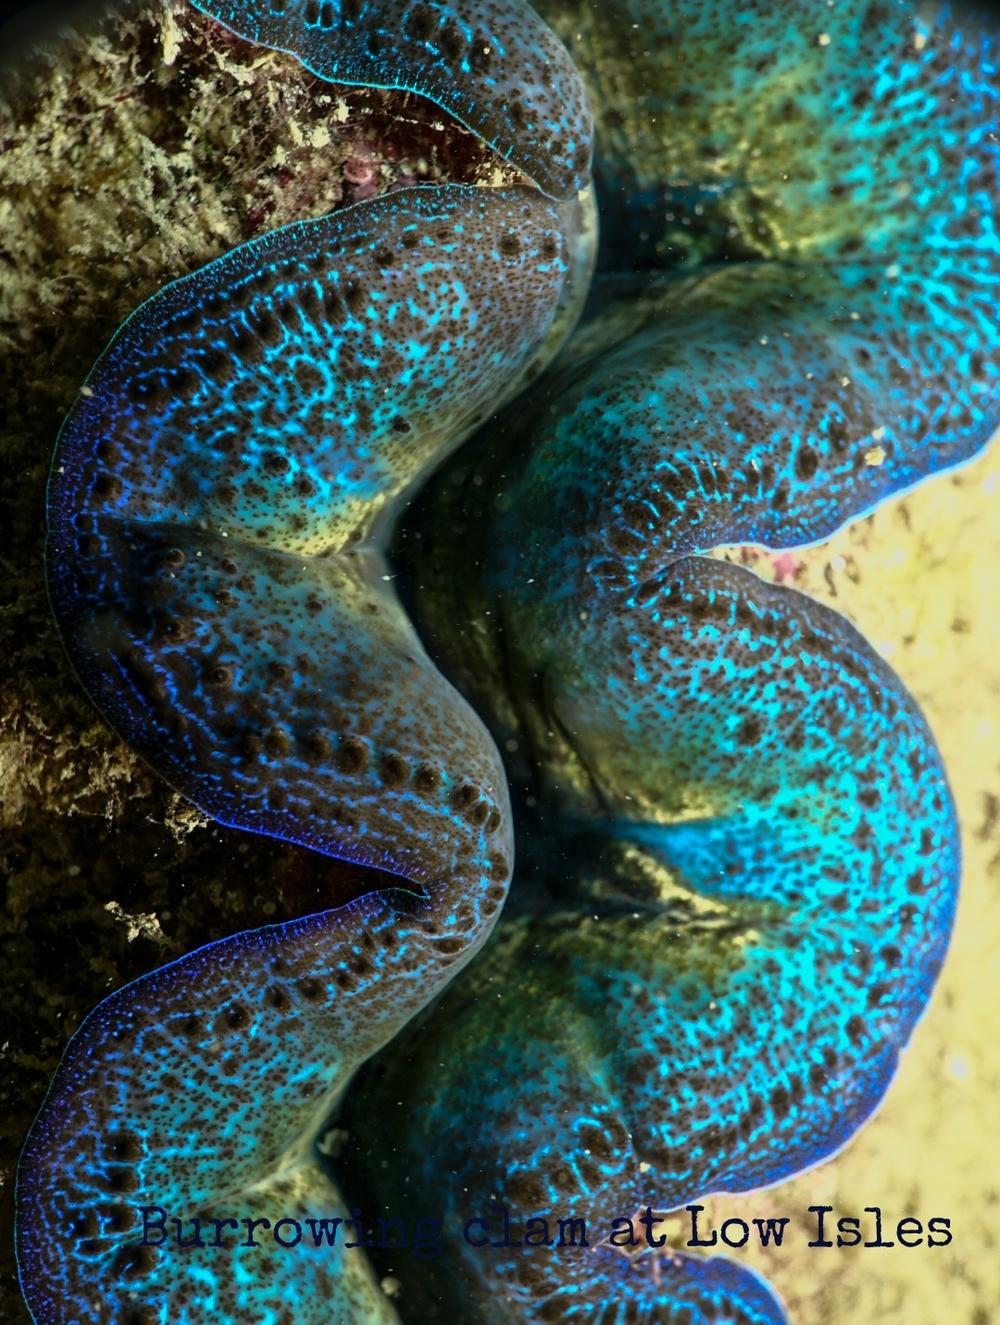 Reef Society Low Isles 160101-1Clam.jpg